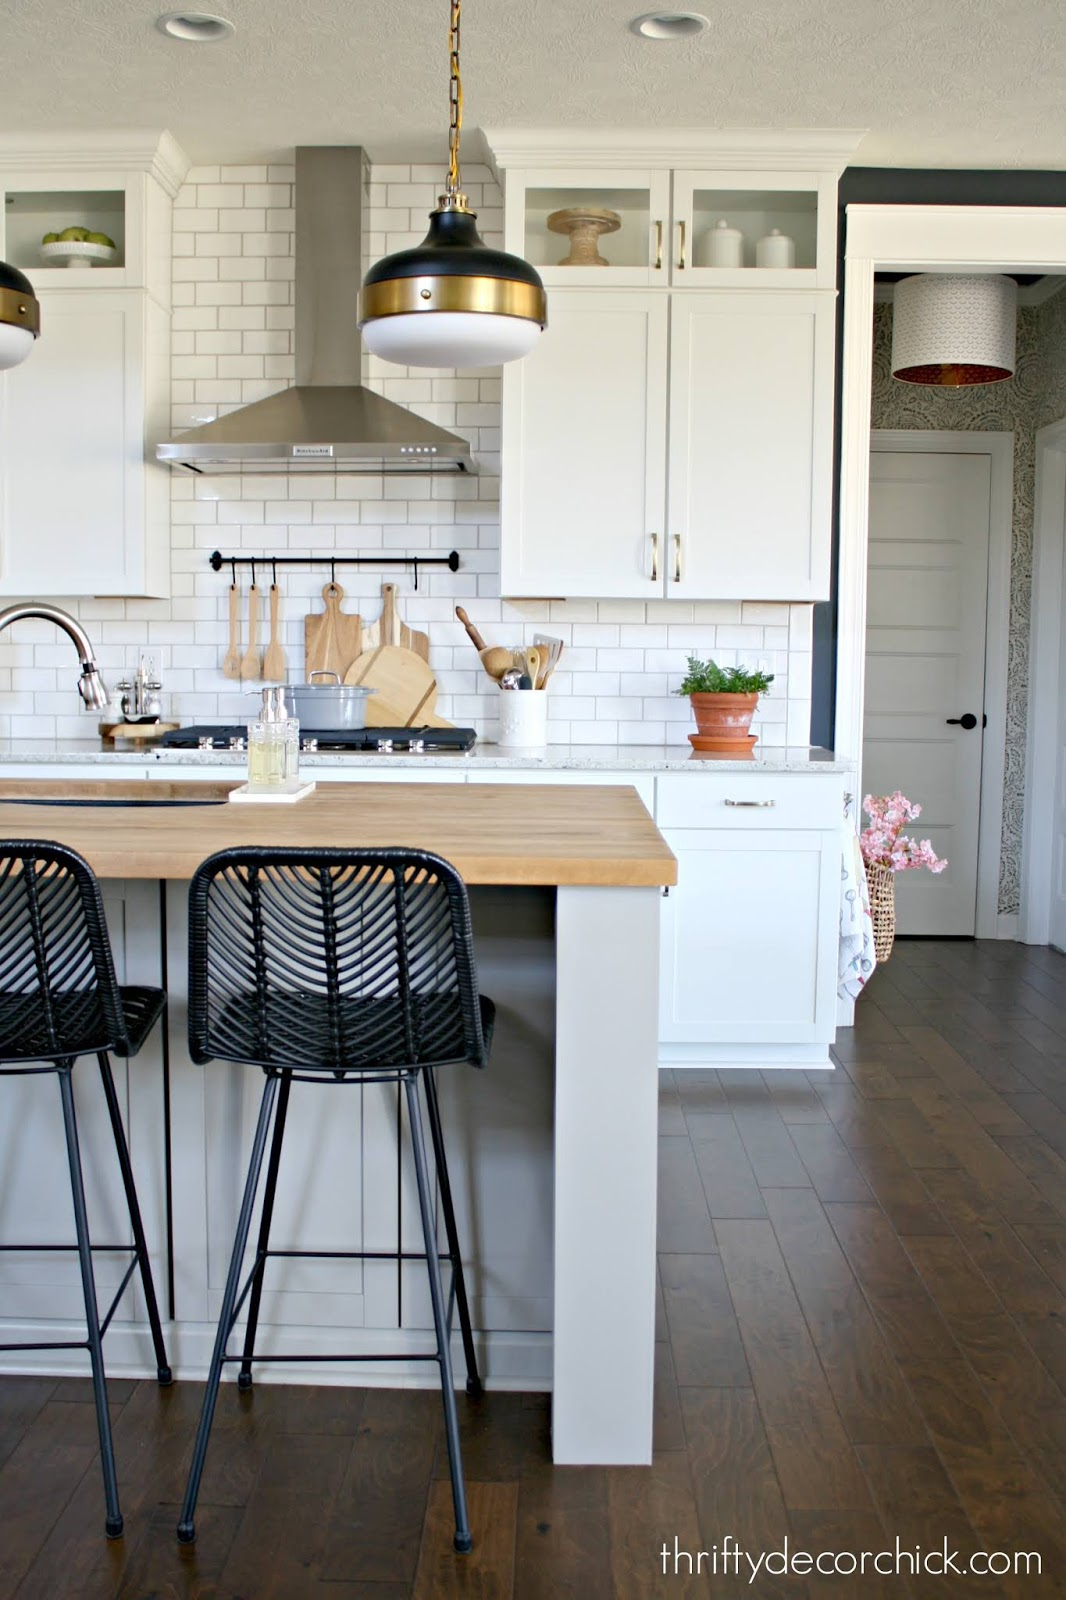 Light gray island, white kitchen cabinets, black stools